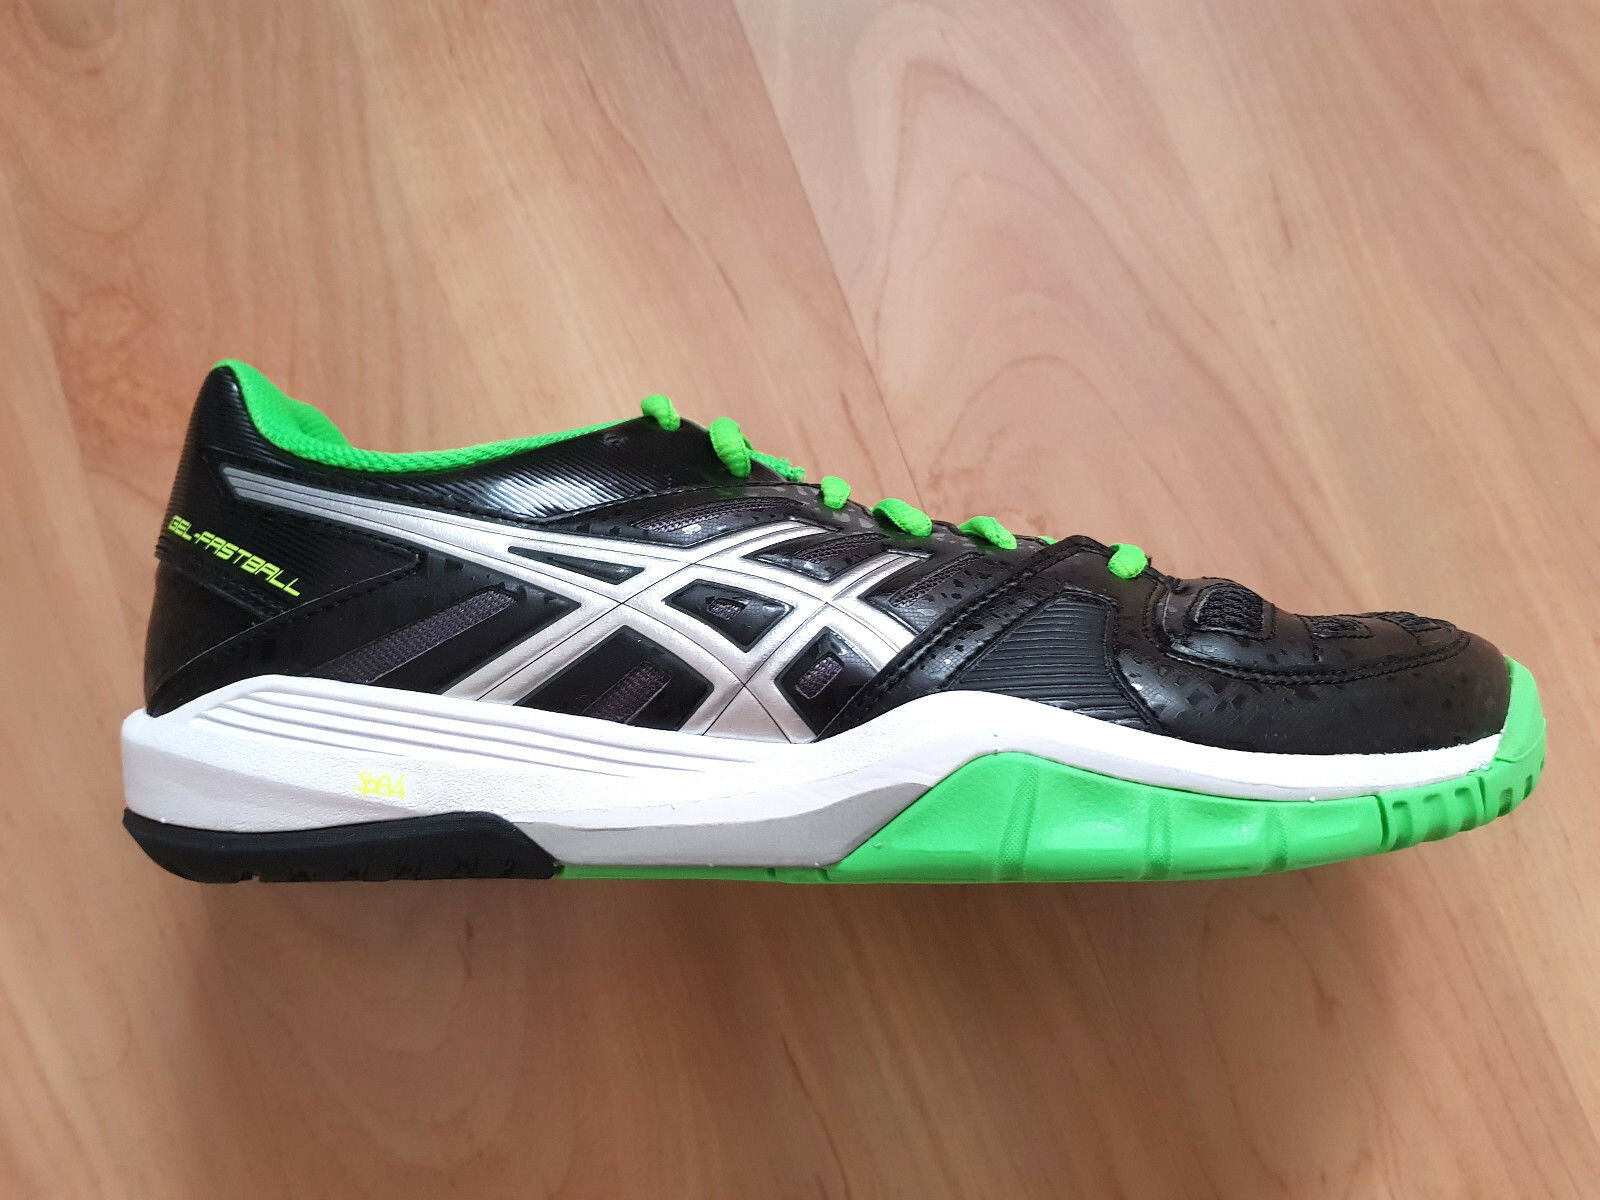 Bsics Sneaker, Modell E414Y 9093, Gr.41,5, Neu